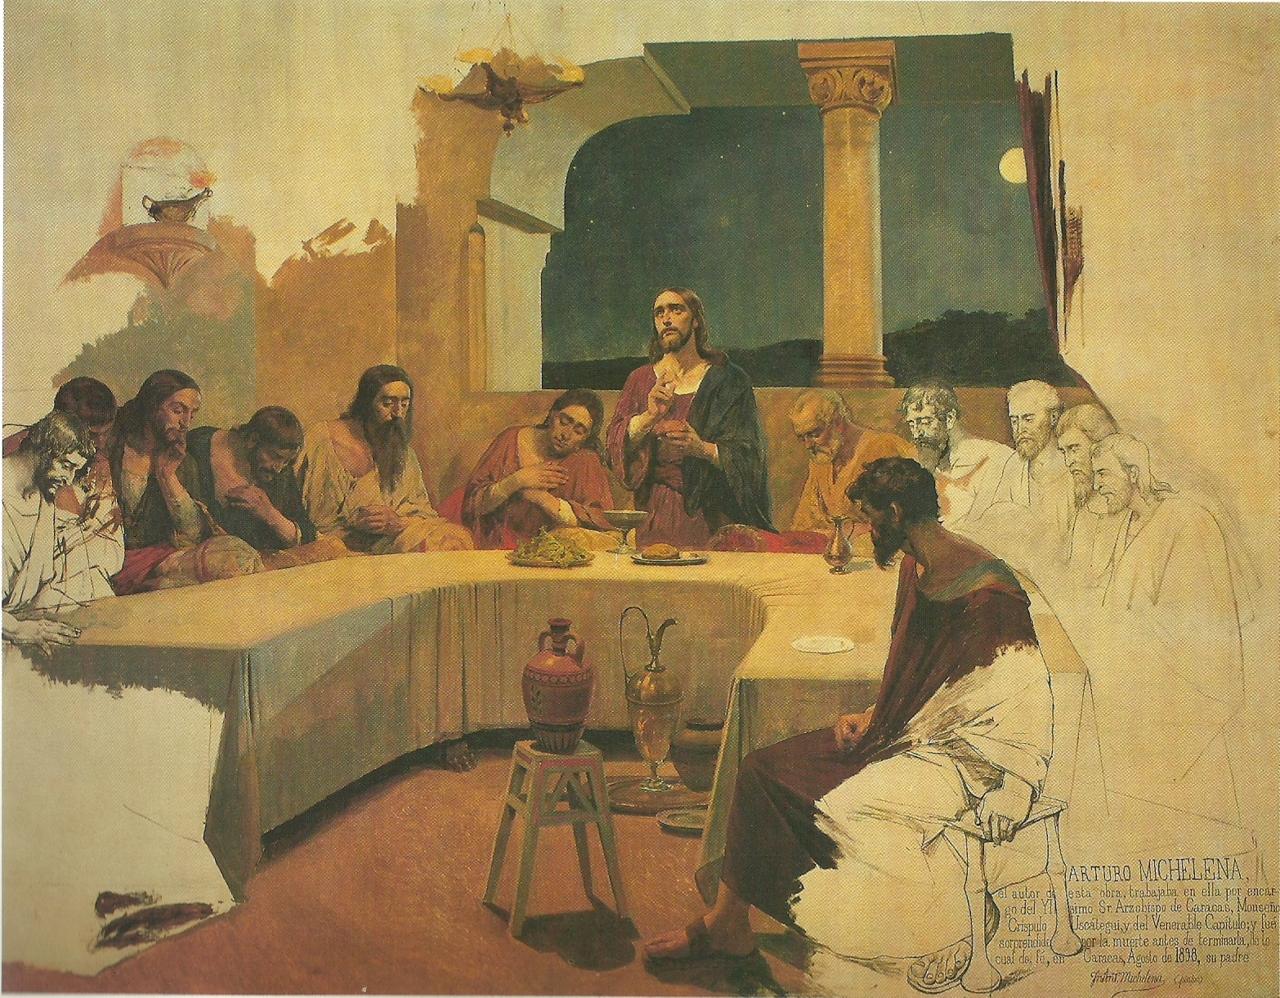 http://uncatolico.com/wp-content/gallery/imagenes-catolicas/195_uncatolicoimgcat.jpg